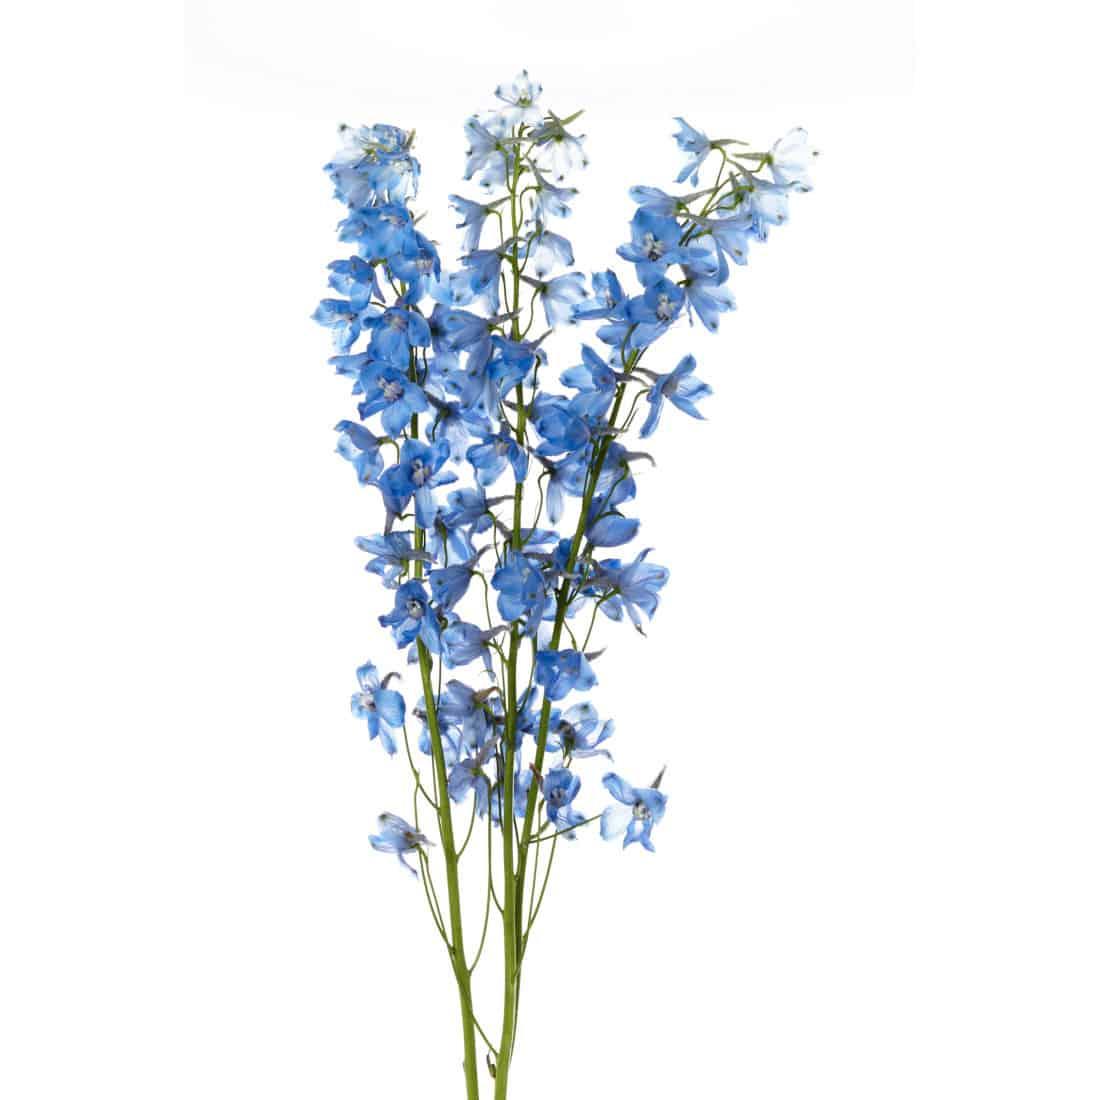 Delphinium Light Blue Metro Flower Market